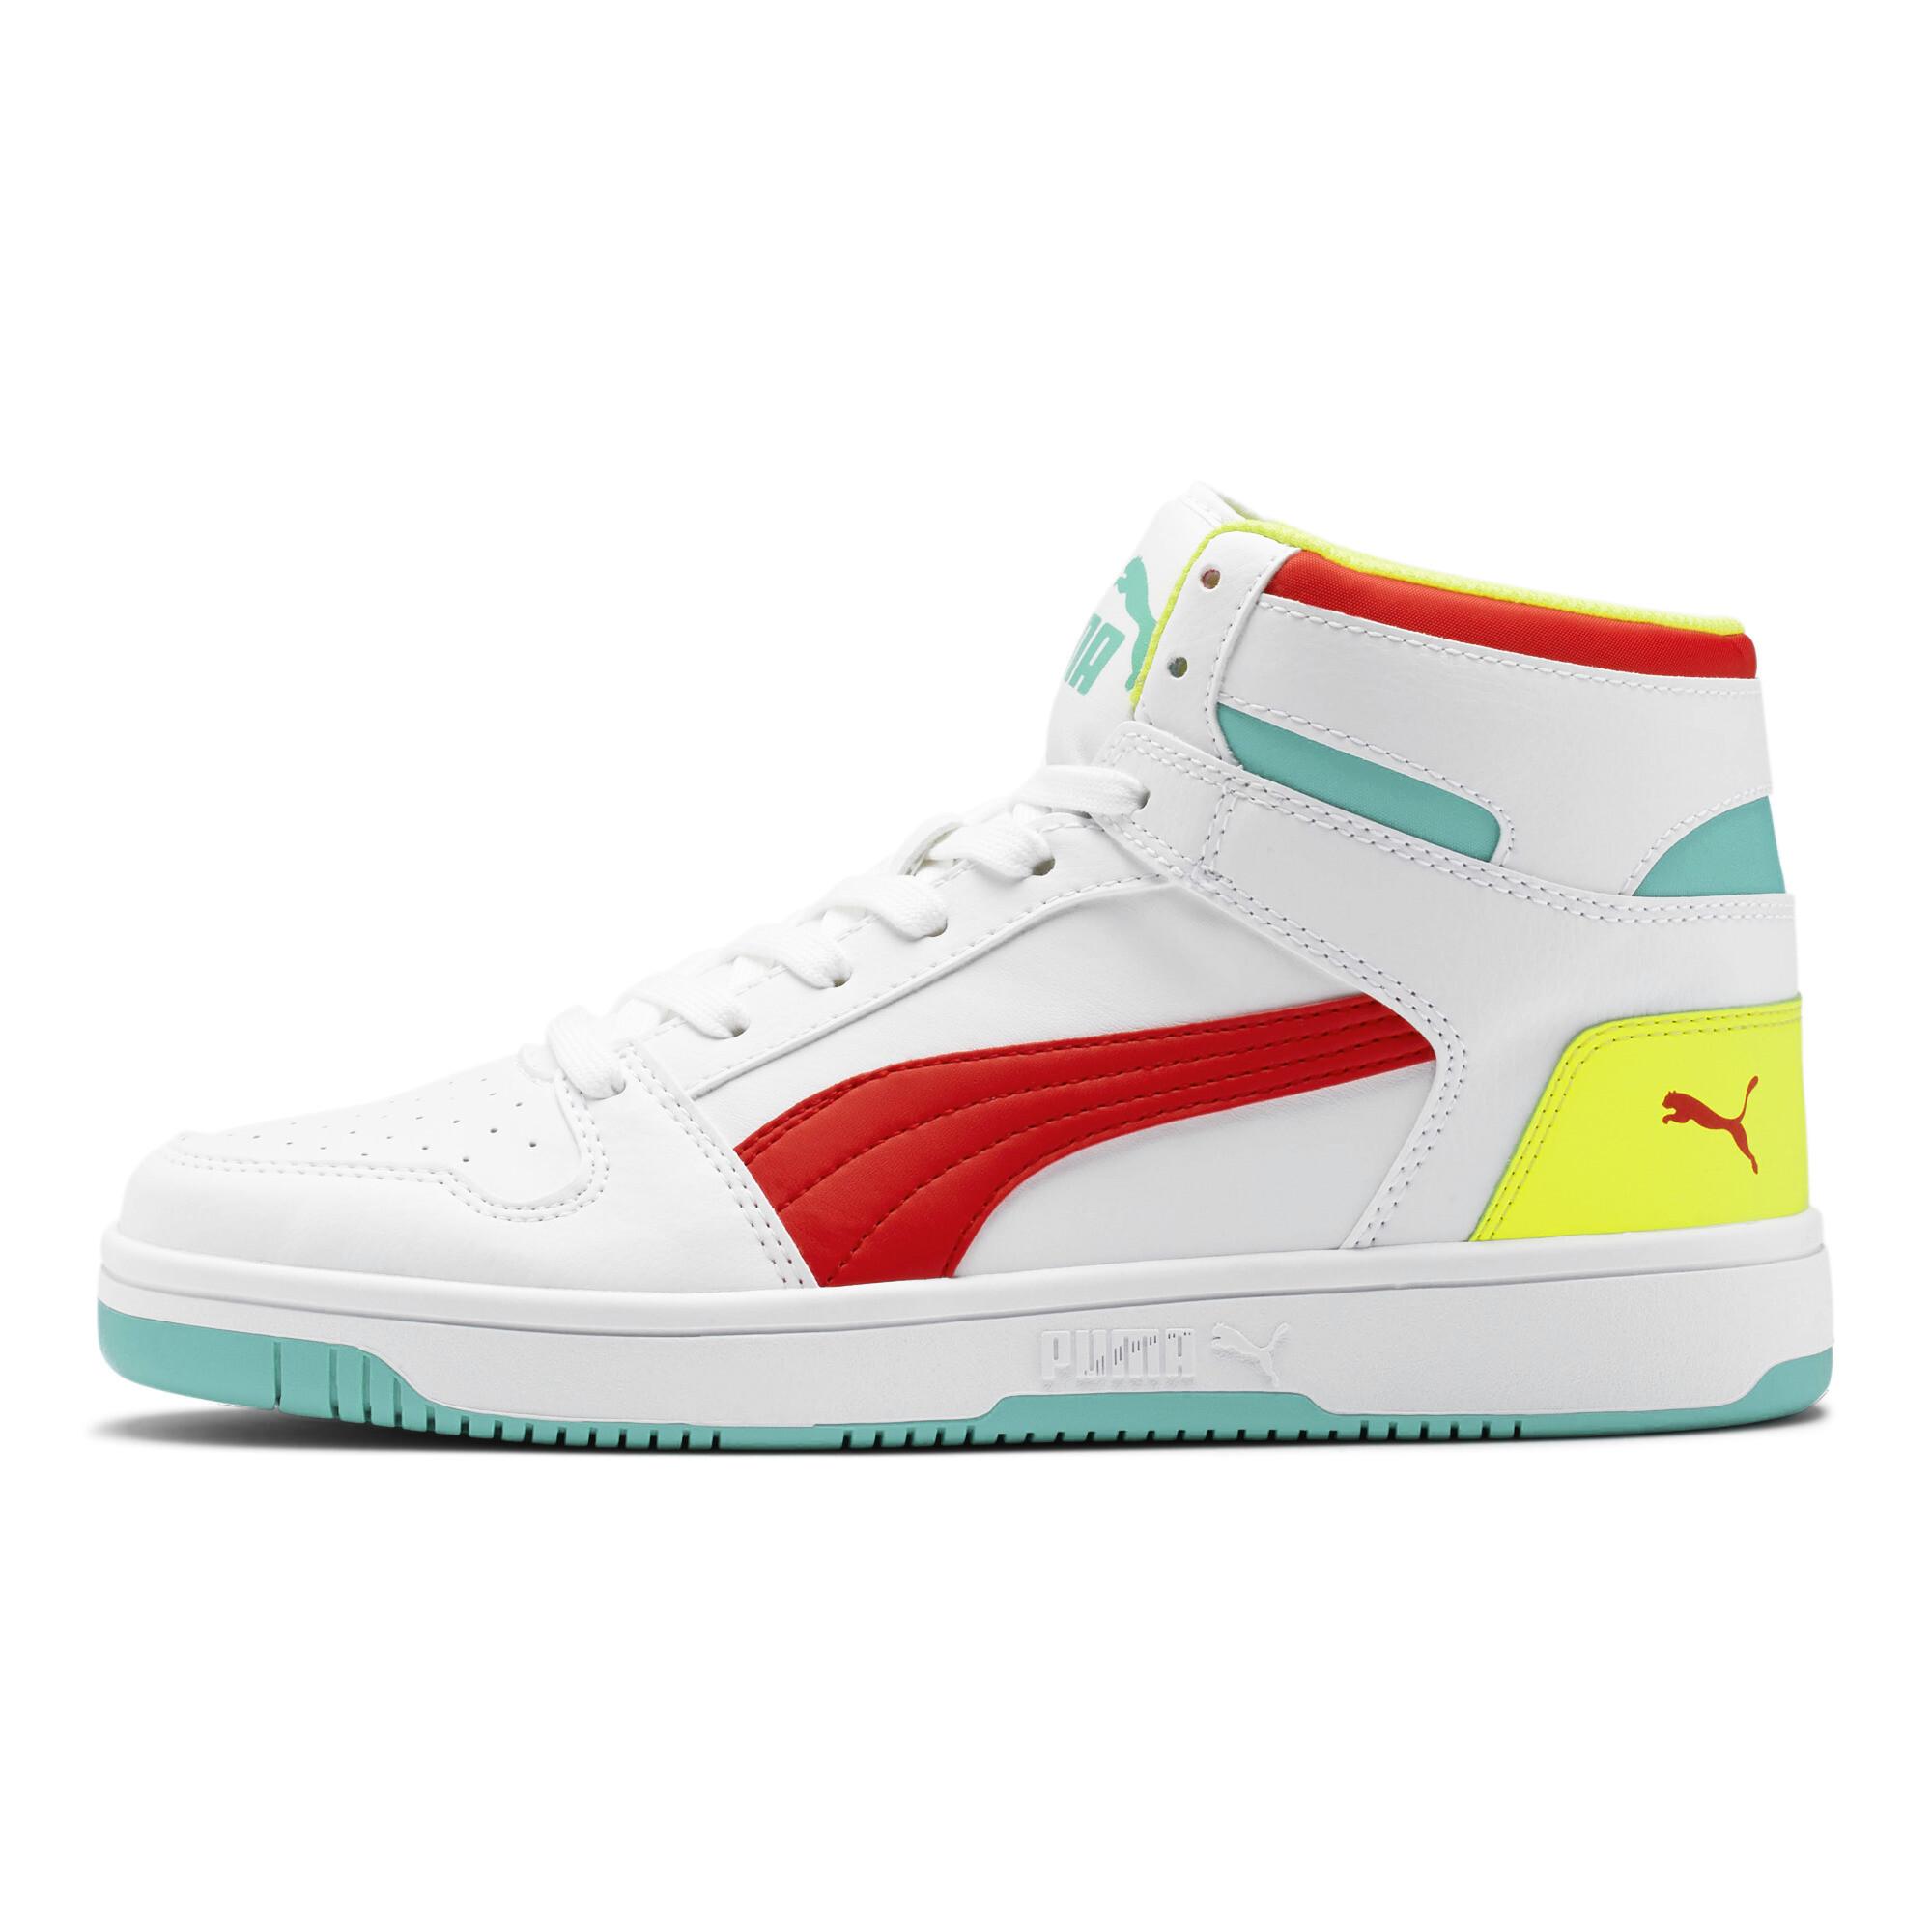 PUMA-PUMA-Rebound-LayUp-Men-039-s-Sneakers-Men-Mid-Boot-Basics thumbnail 31